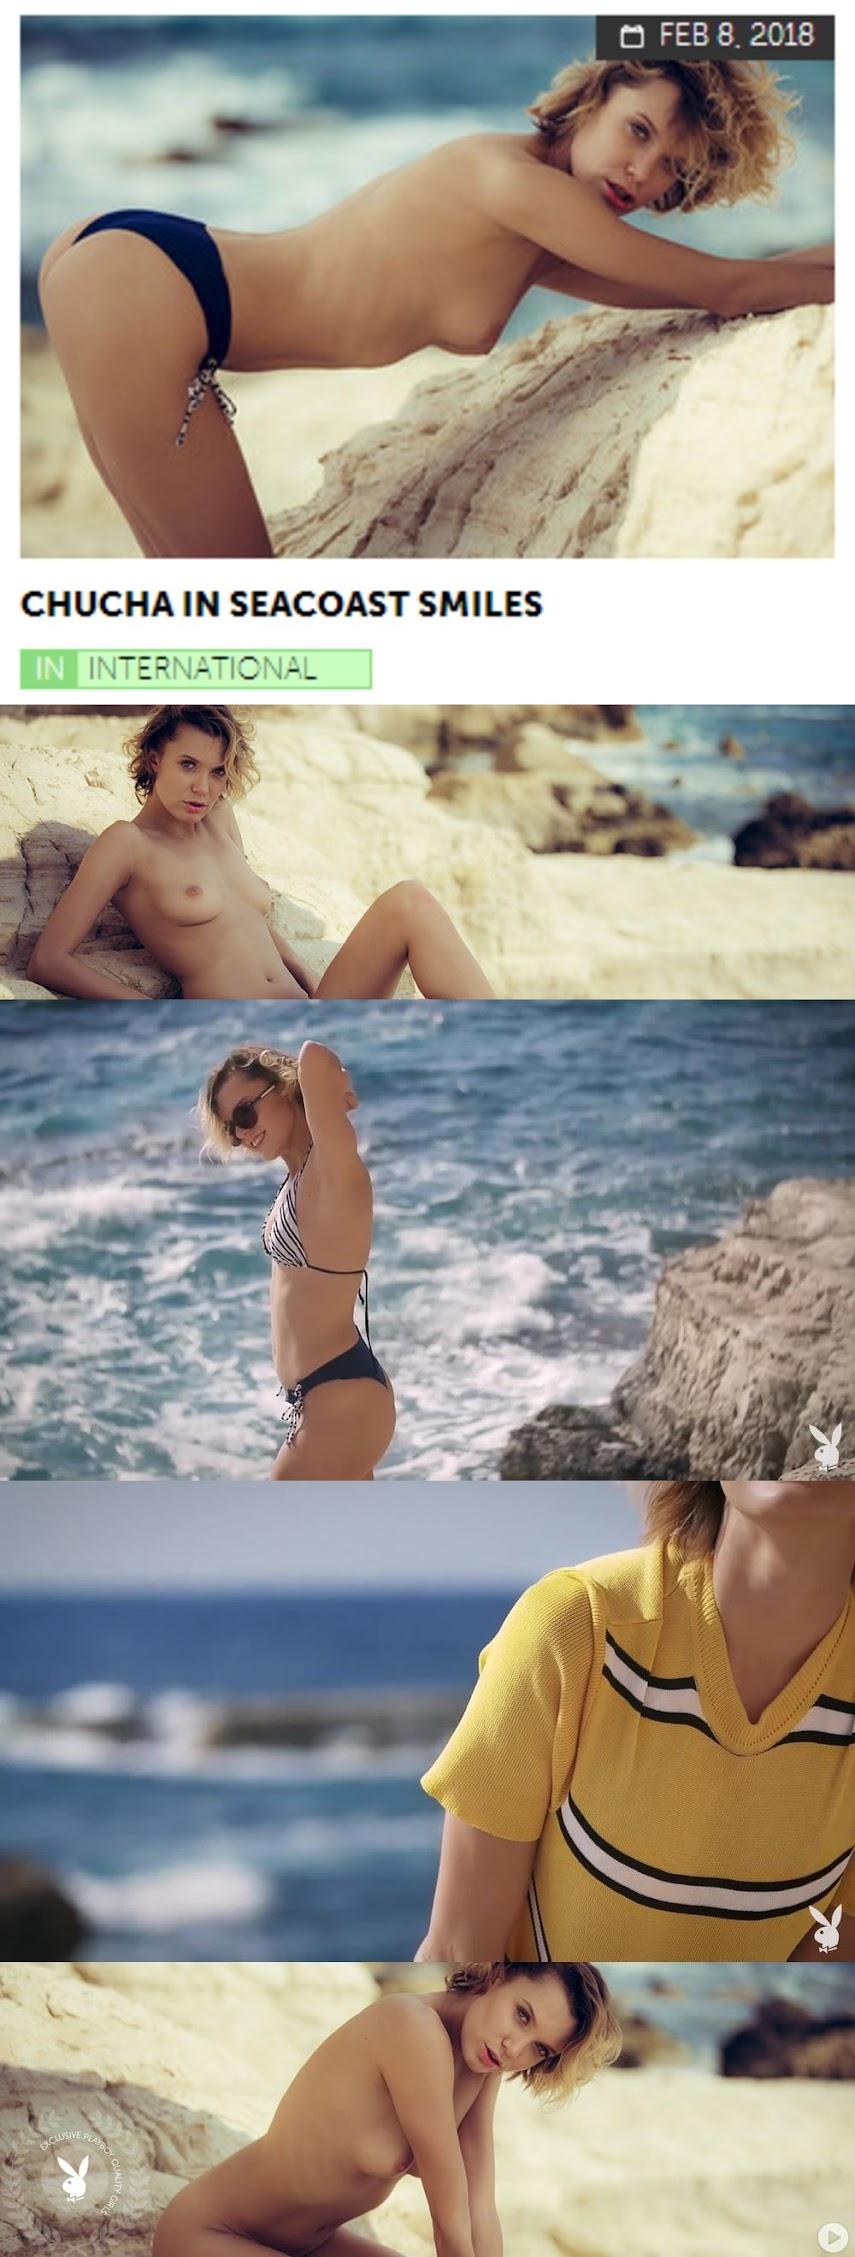 Playboy PlayboyPlus2018-02-08 Chucha in Seacoast Smiles - Girlsdelta